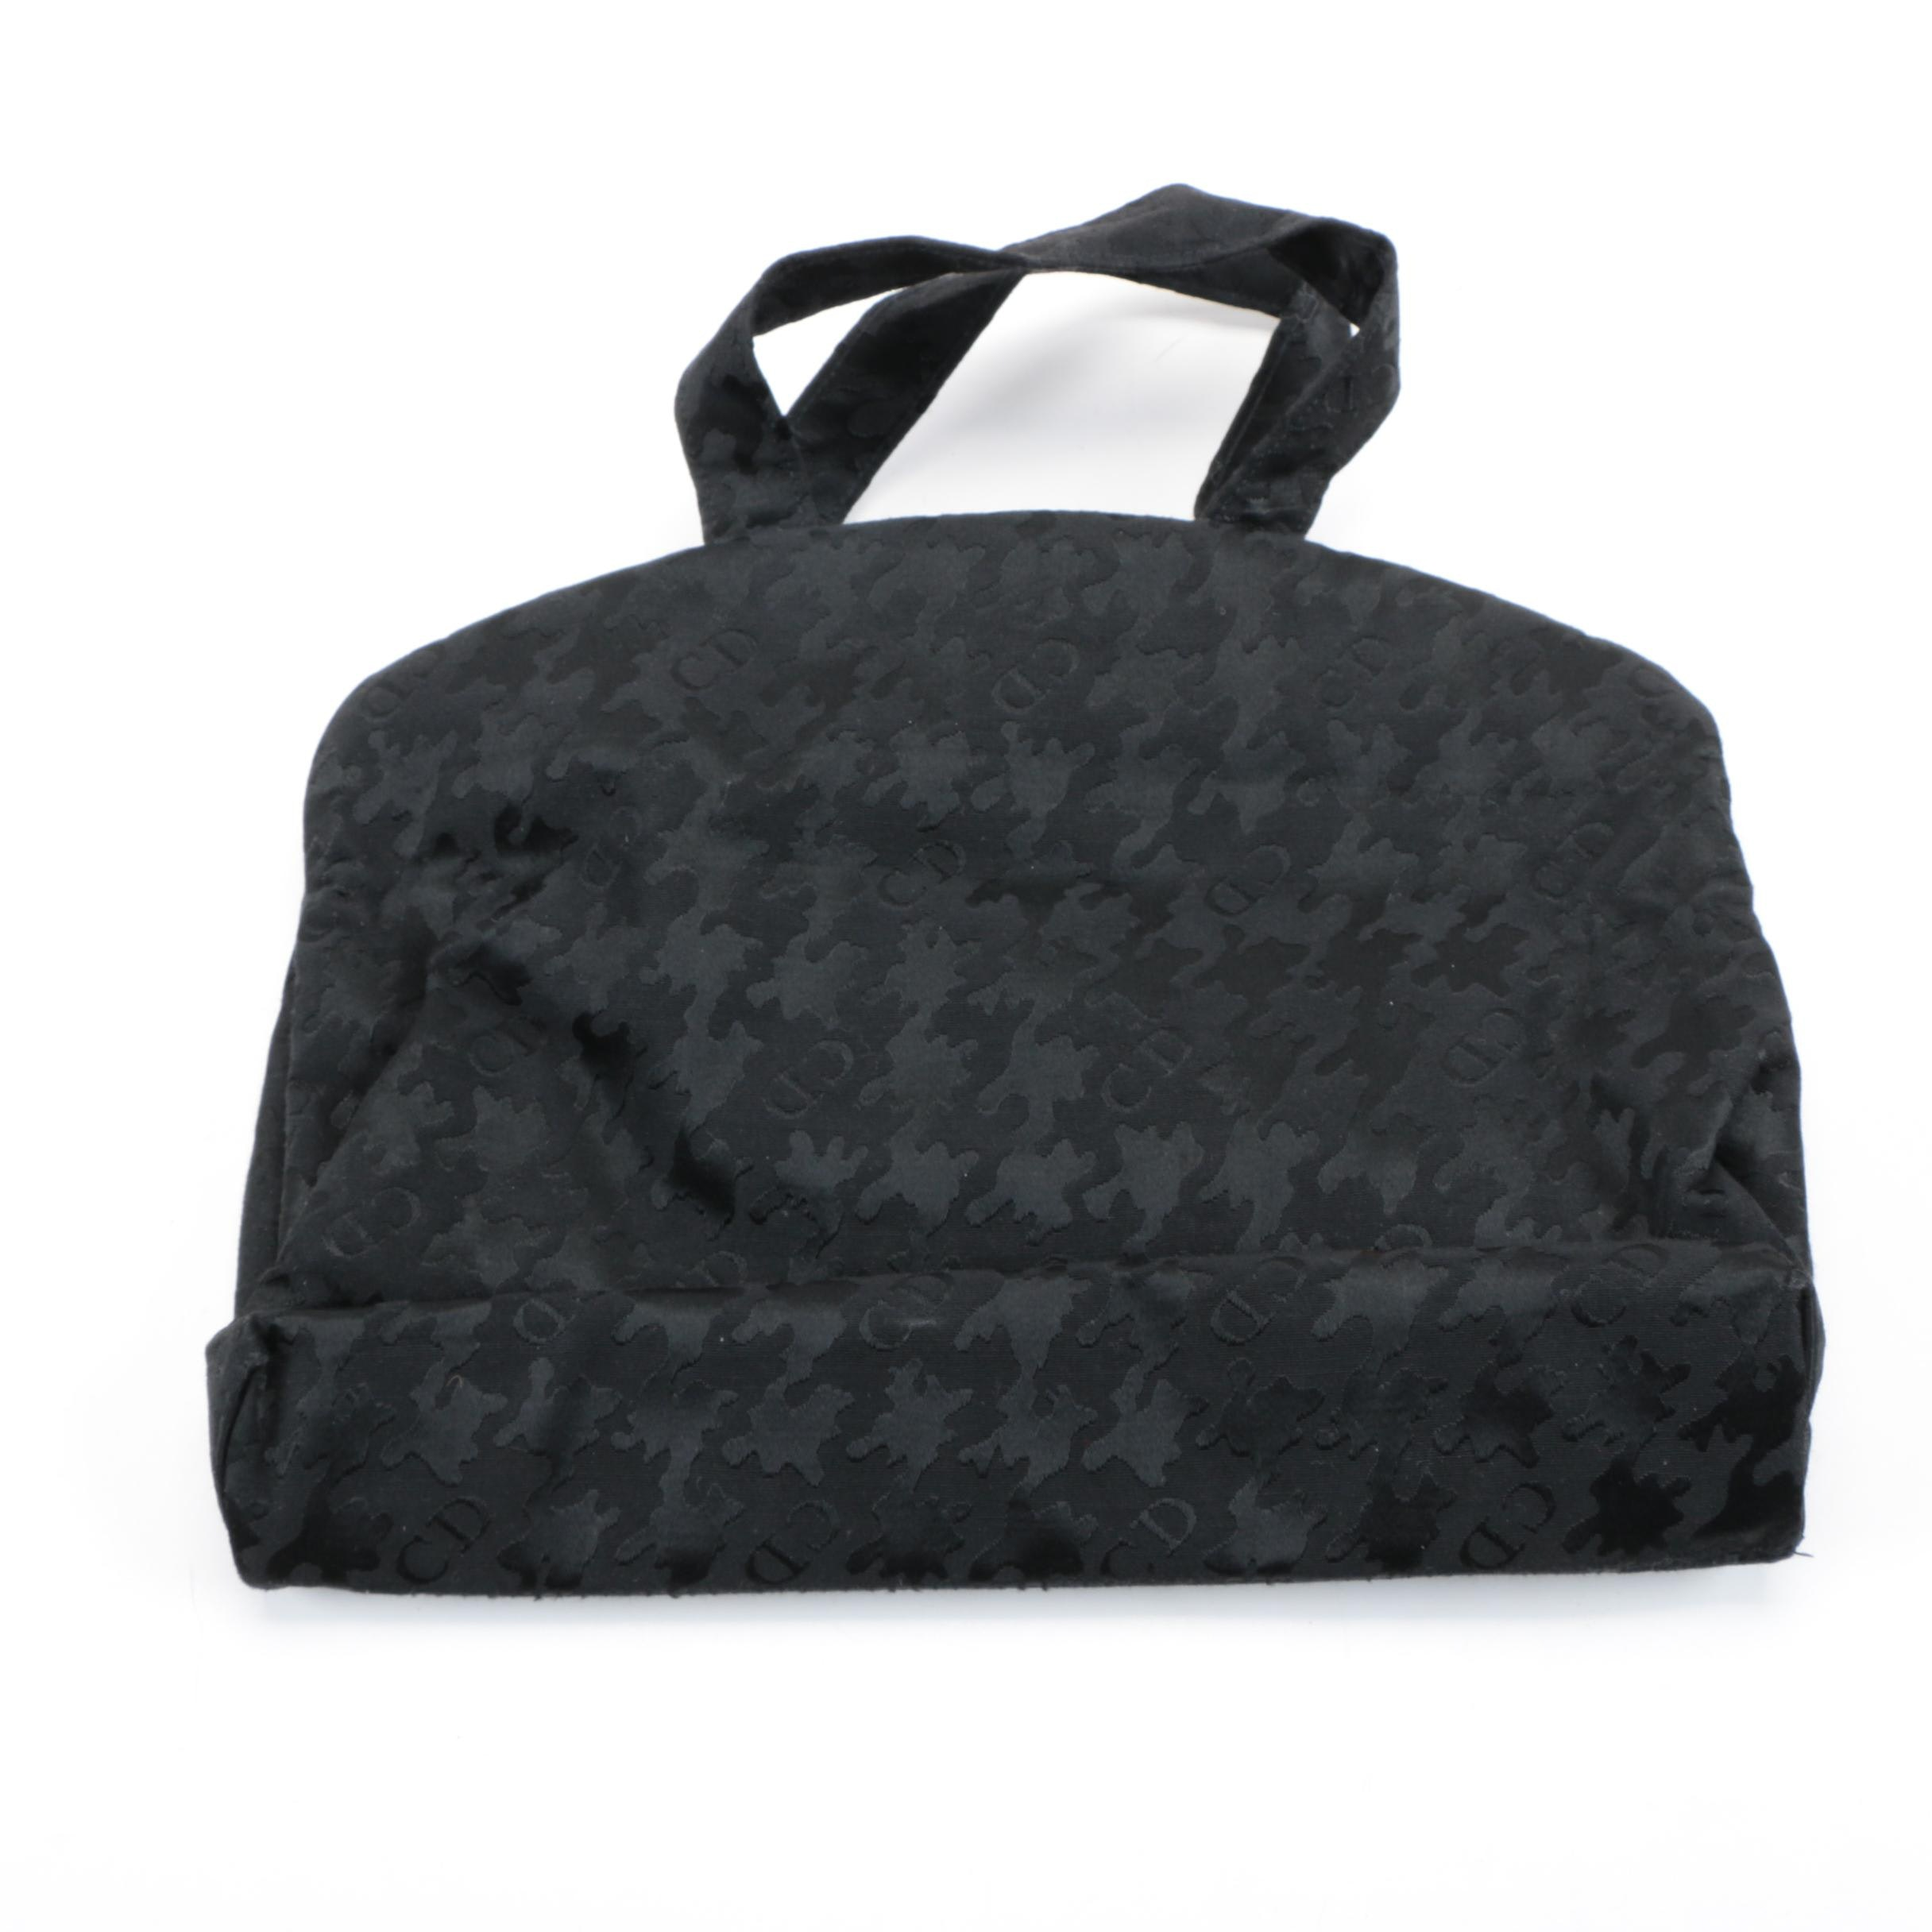 Christian Dior Toiletry Bag